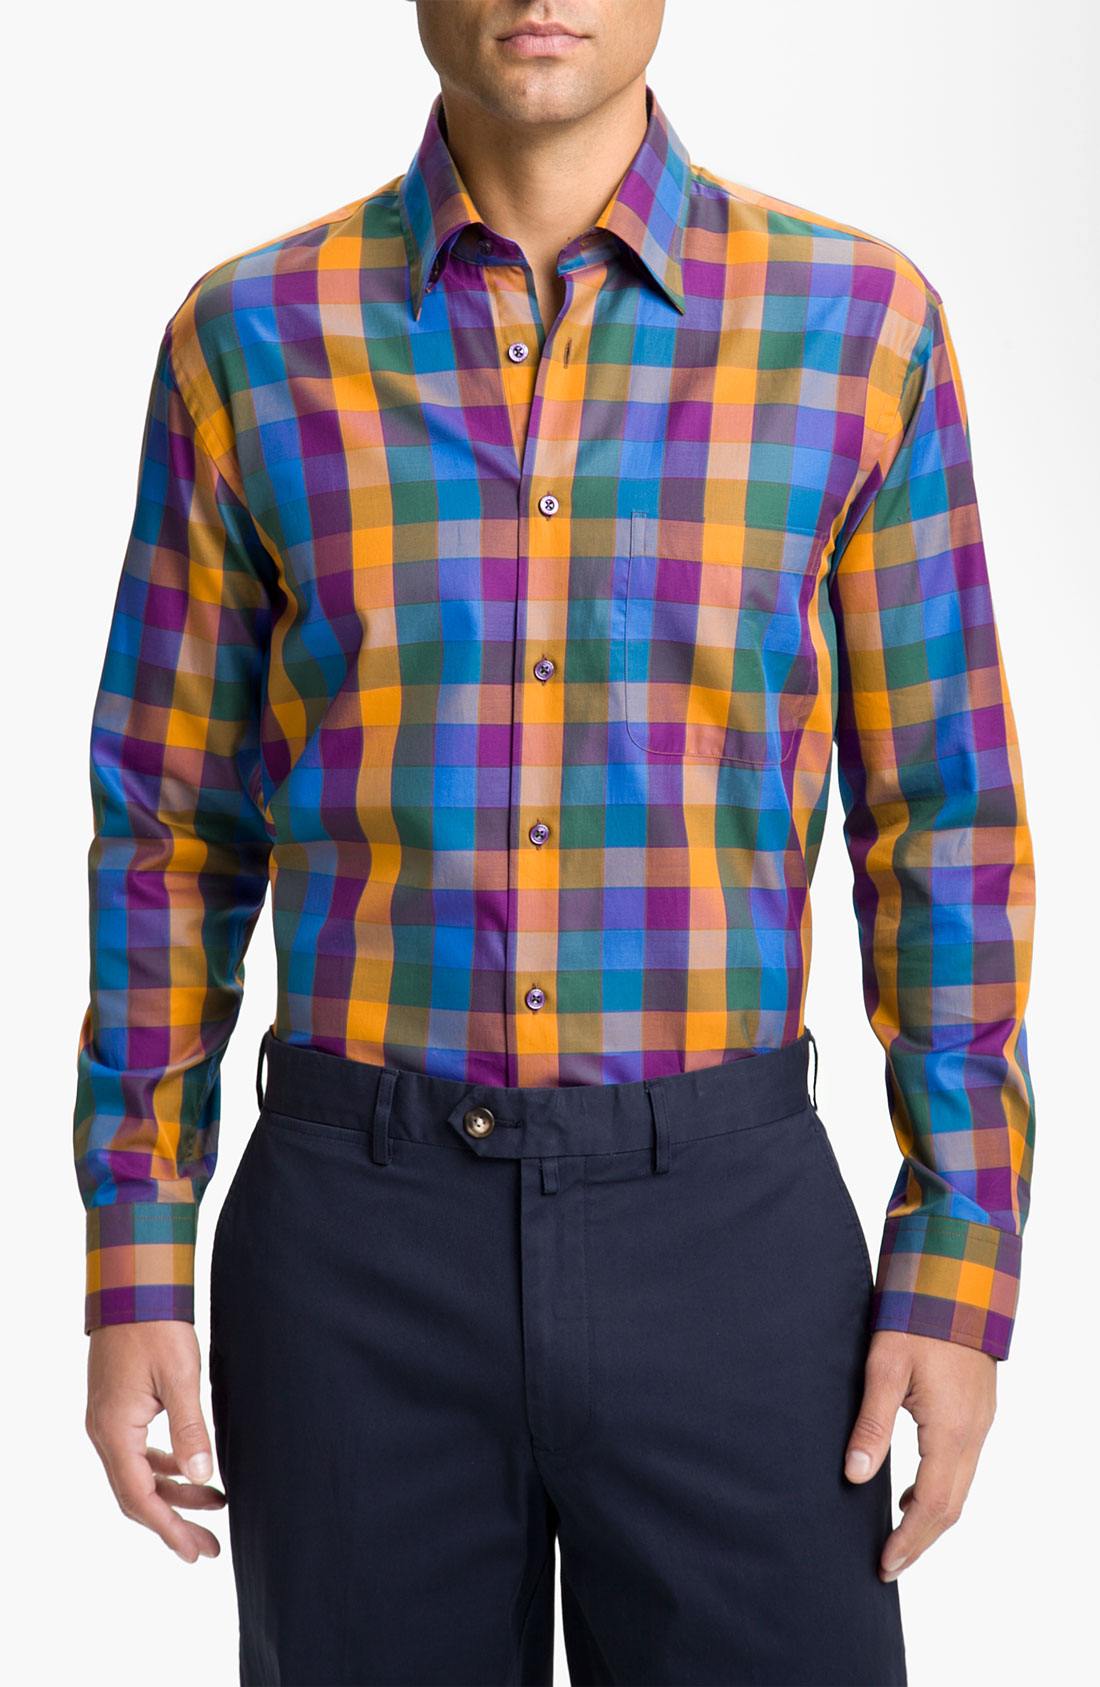 Robert talbott regular fit sport shirt in multicolor for for Robert talbott shirts sale